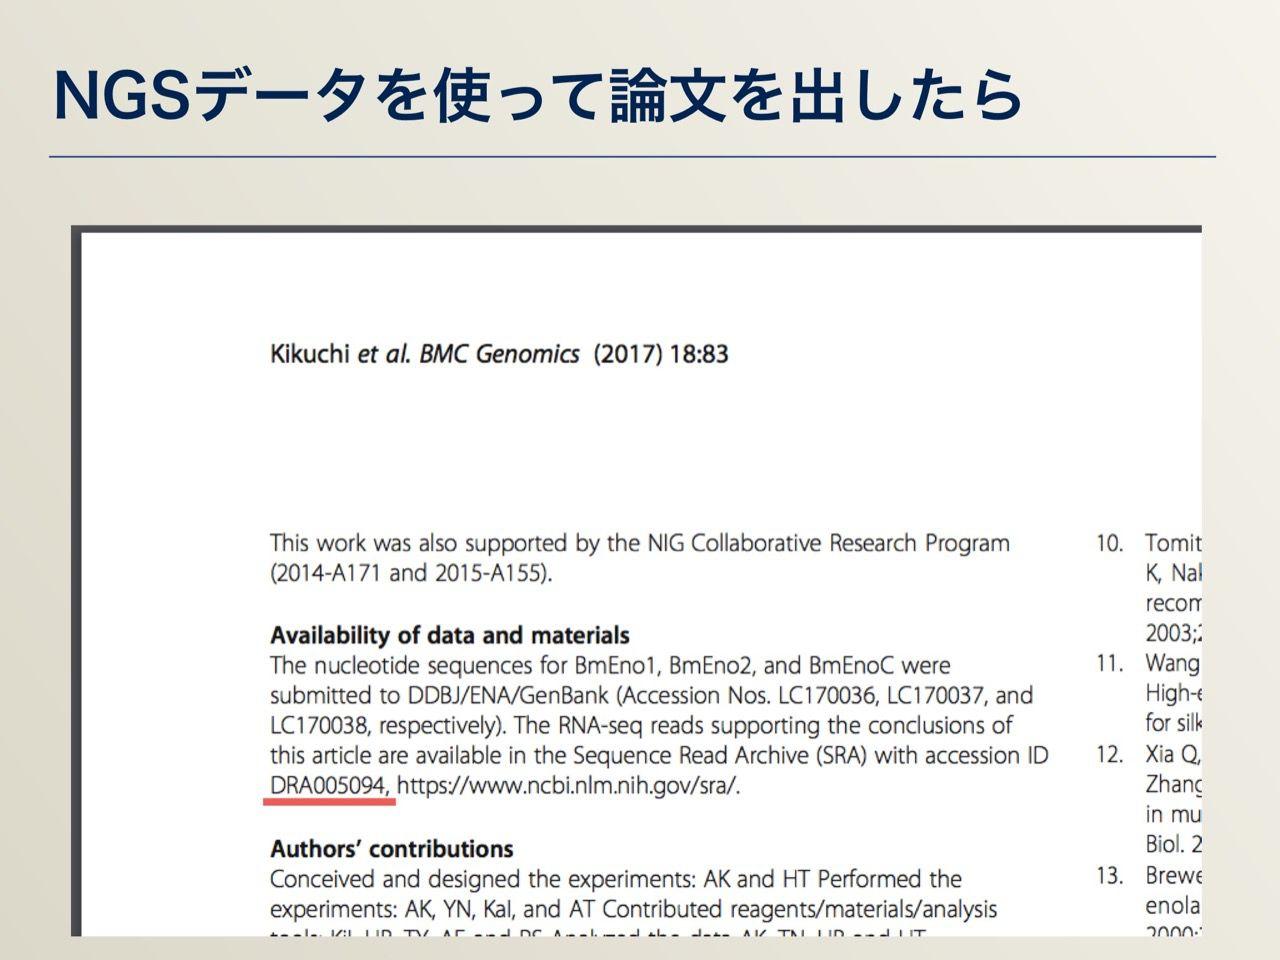 images/AJACS64_03_nakazato_031.jpg